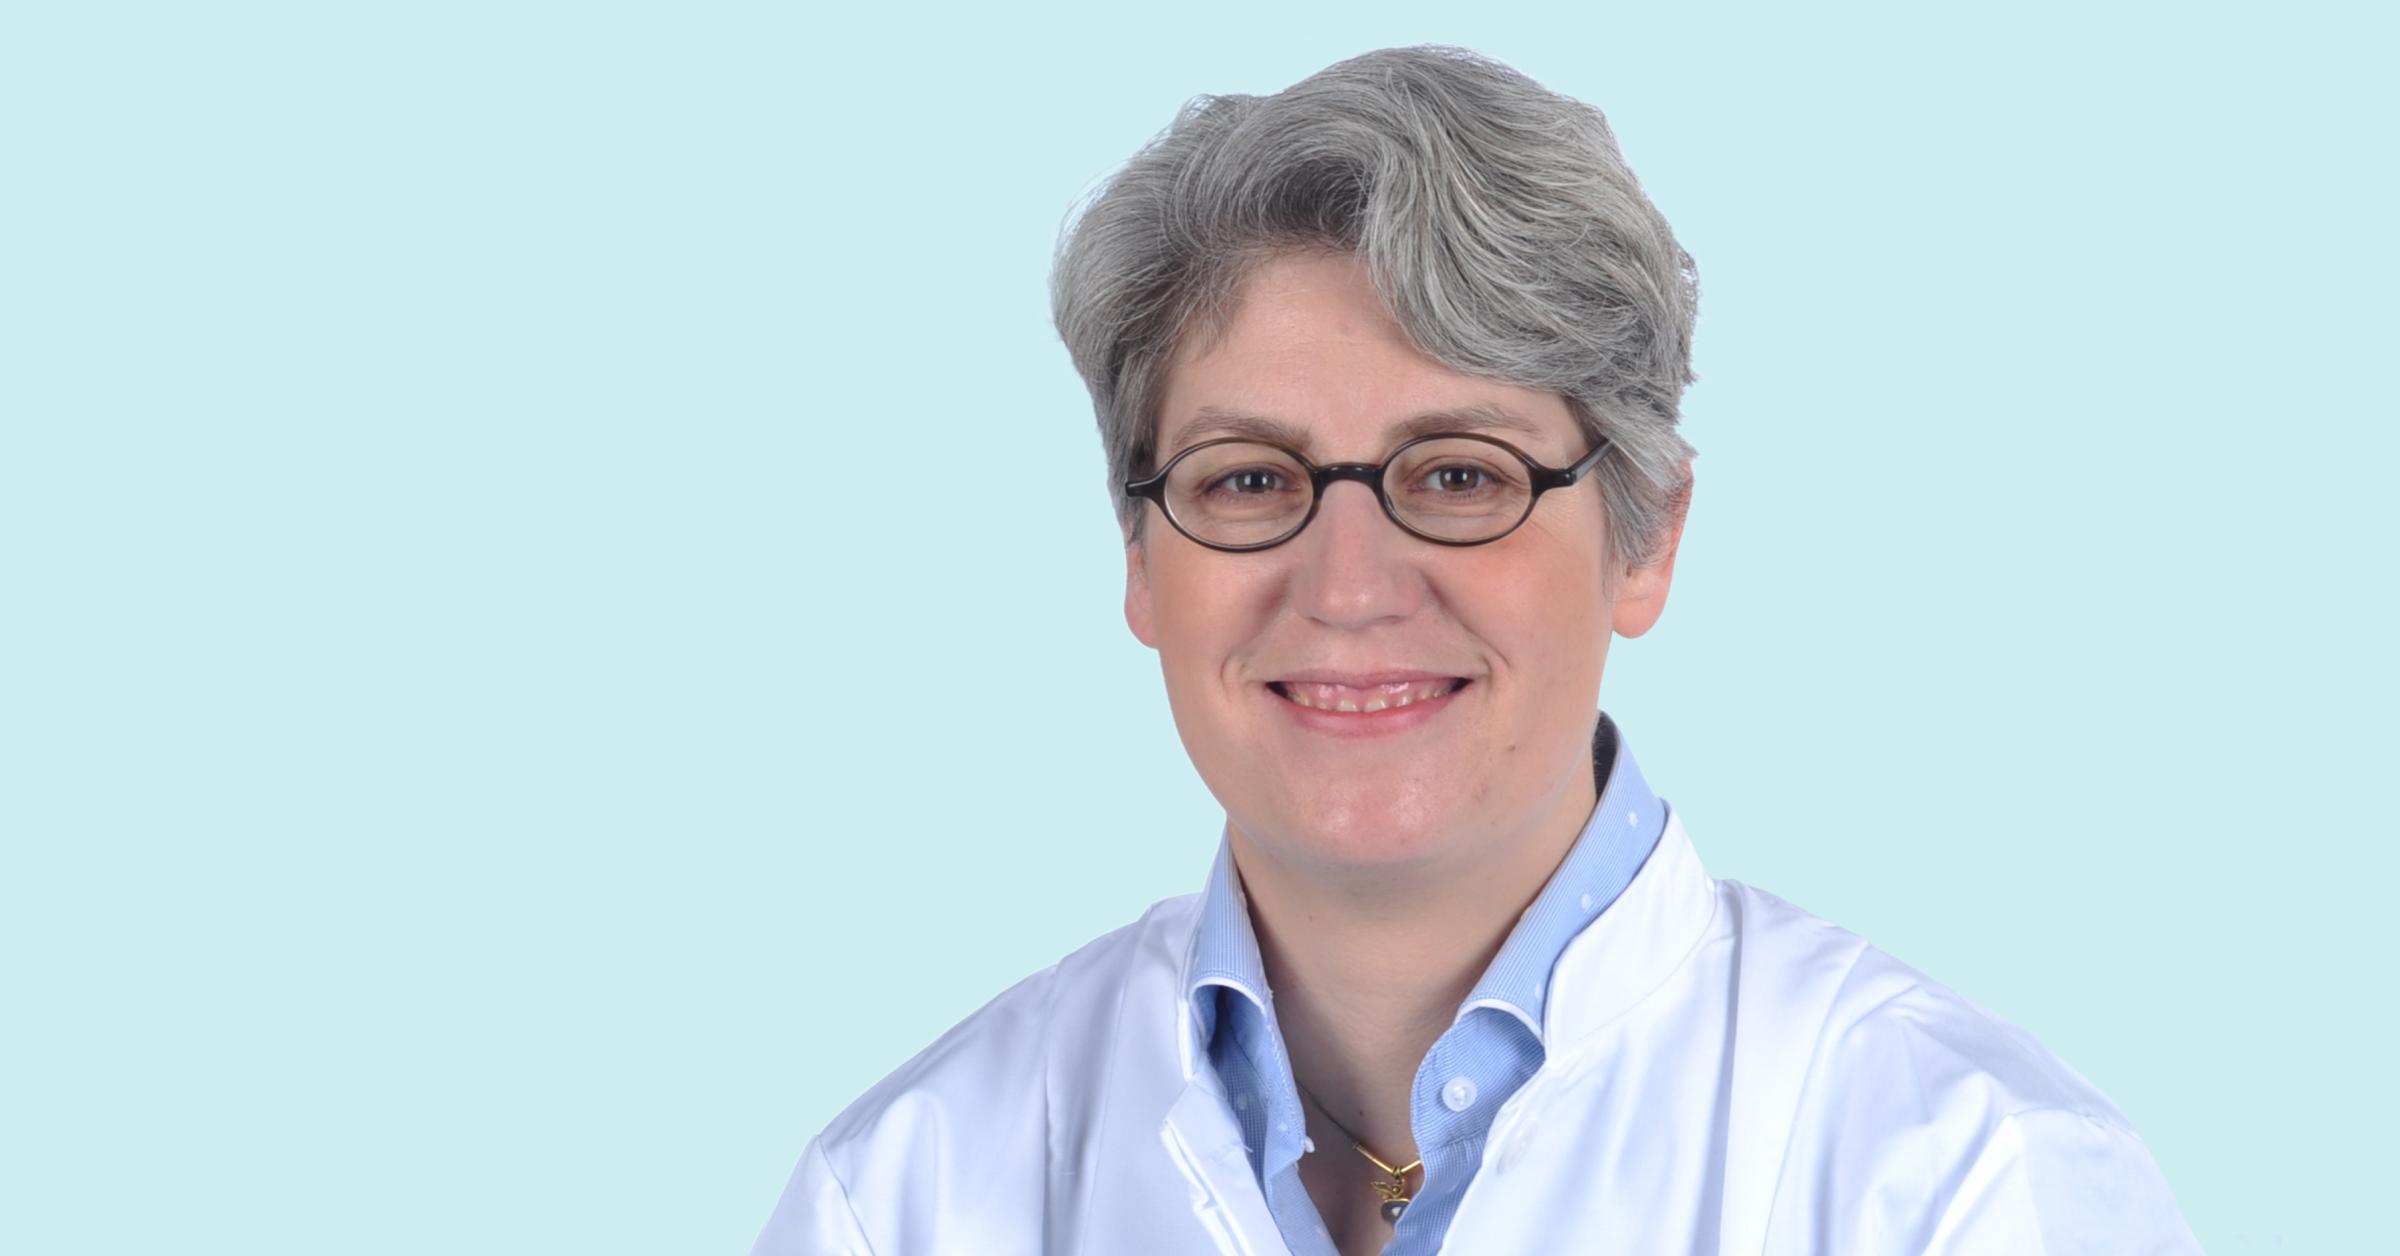 Prof. Julia Mayerle lächelt in die Kamera